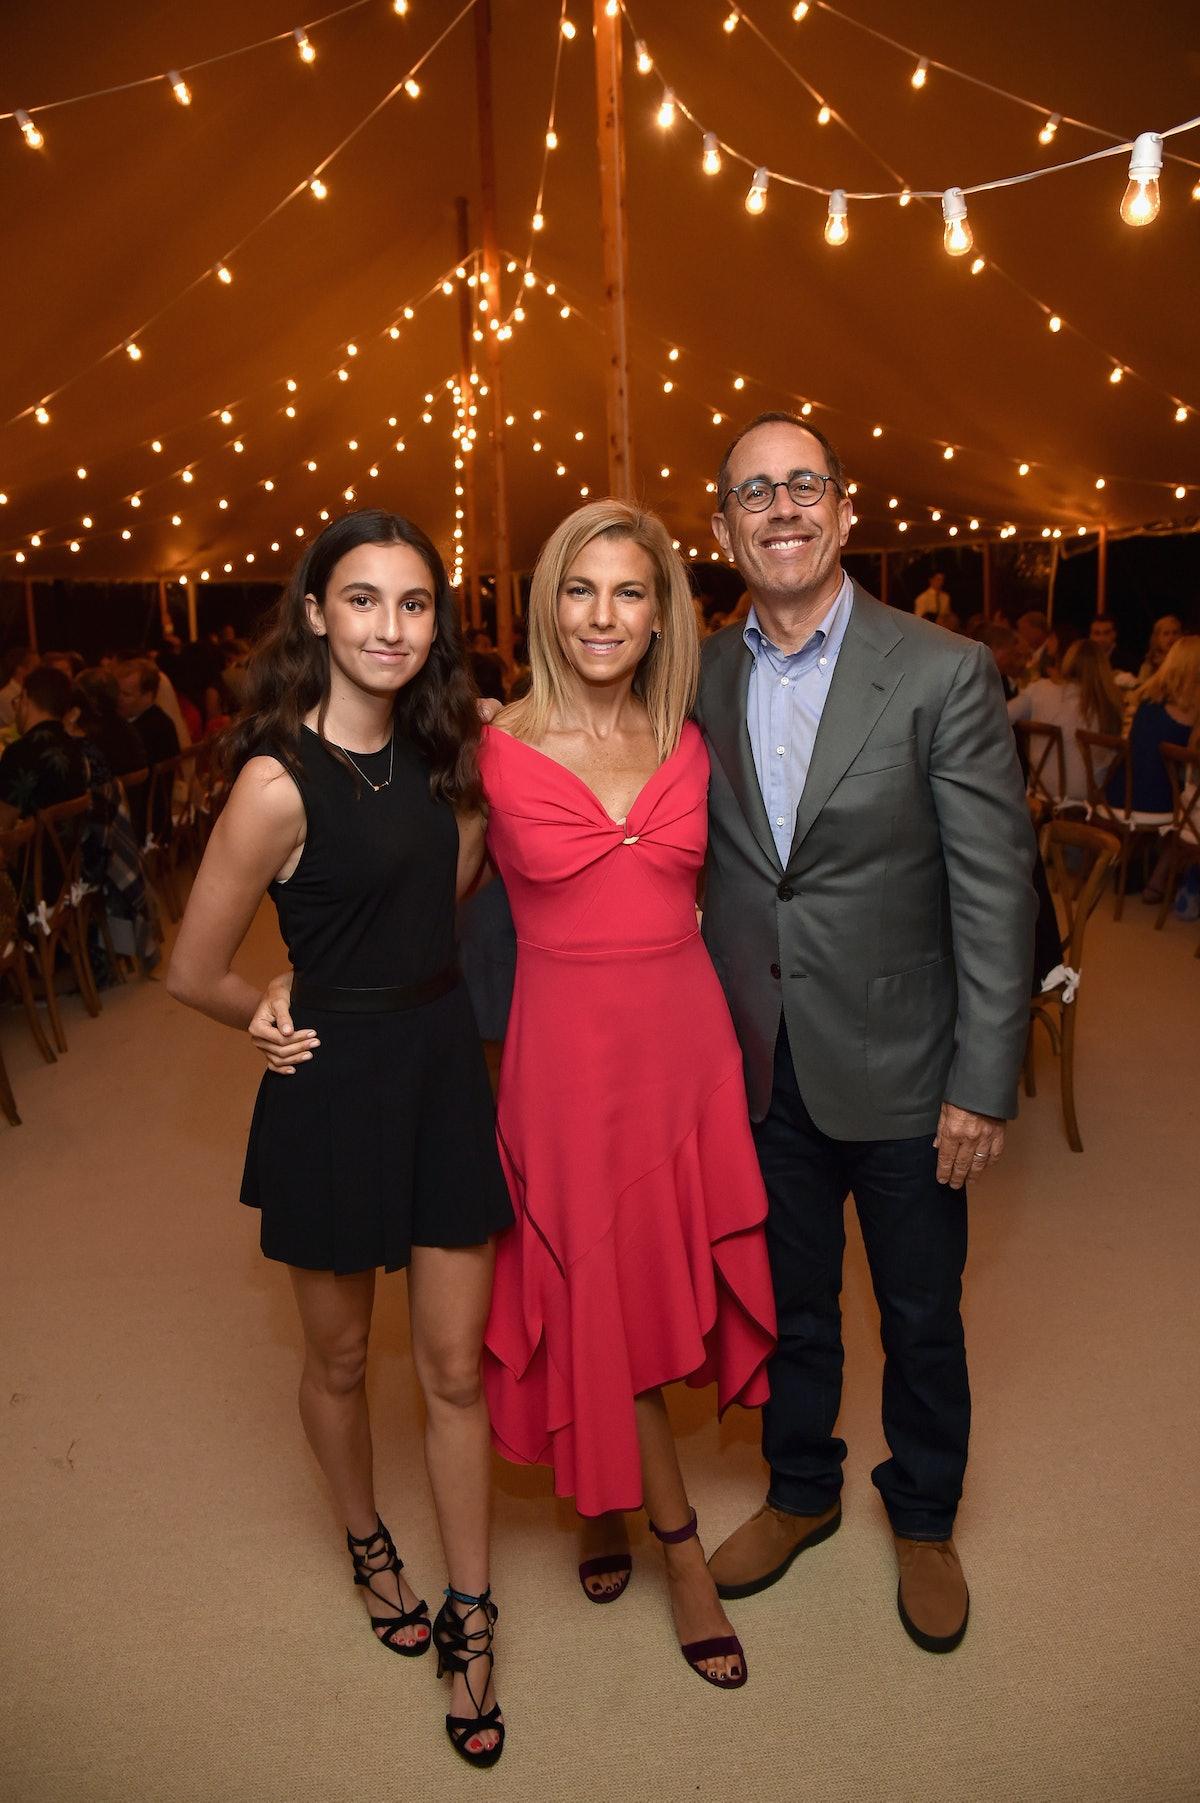 NET-A-PORTER Co-Hosts The GOOD+ Foundation's Hamptons Summer Dinner - Inside